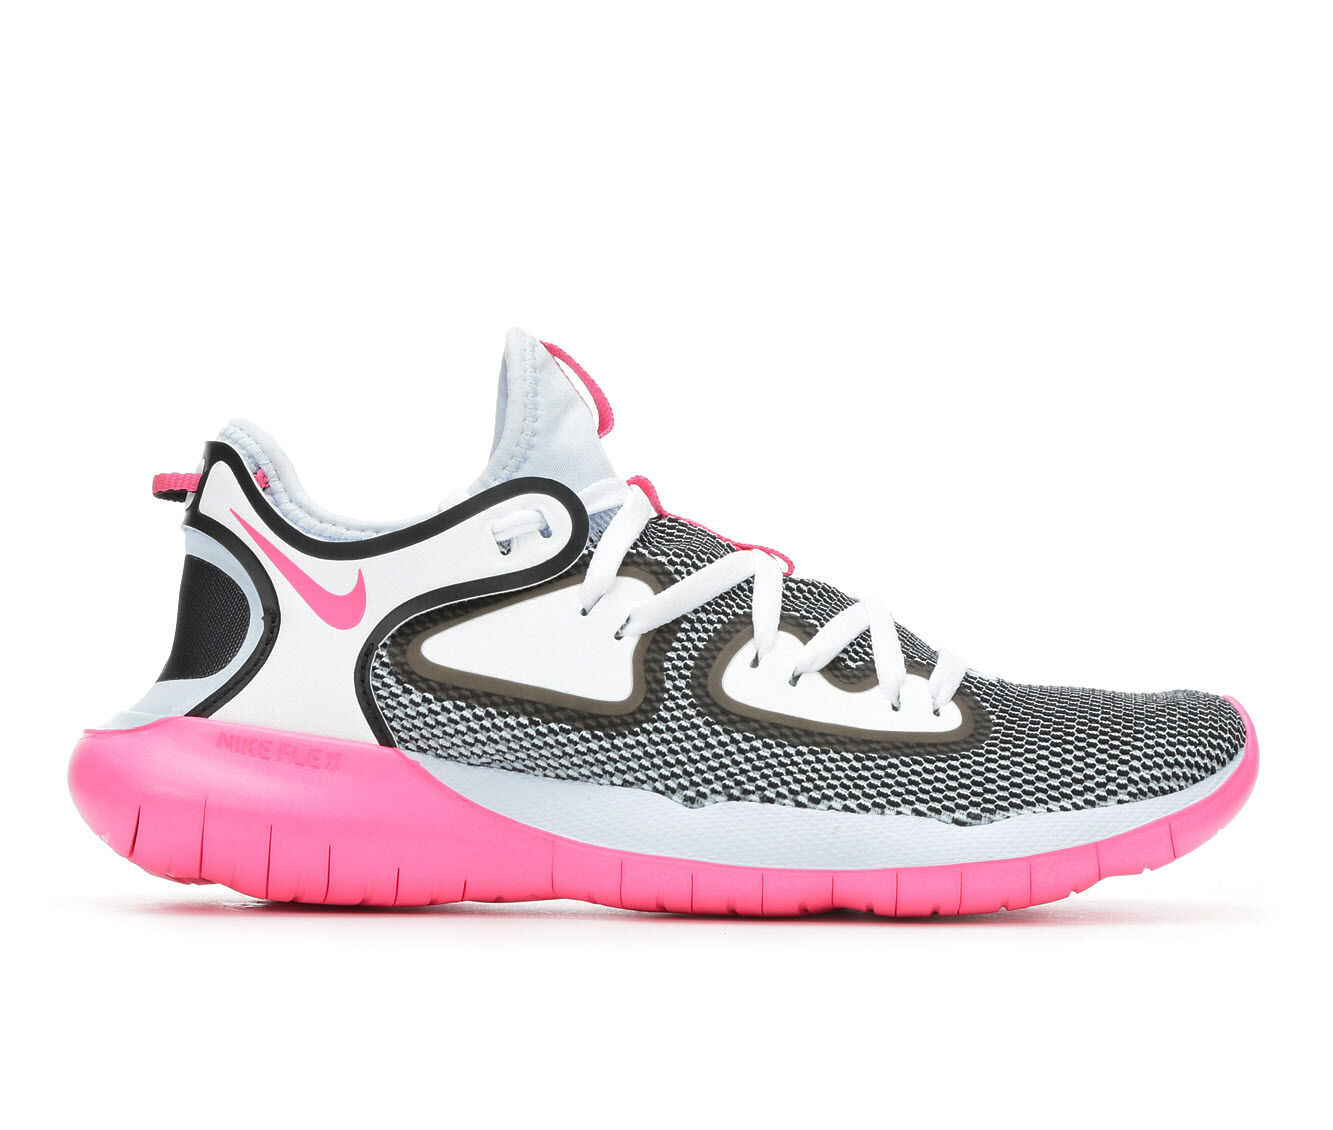 Women's Nike Flex 2019 RN Running Shoes Blue/Pink/Wh/Bk